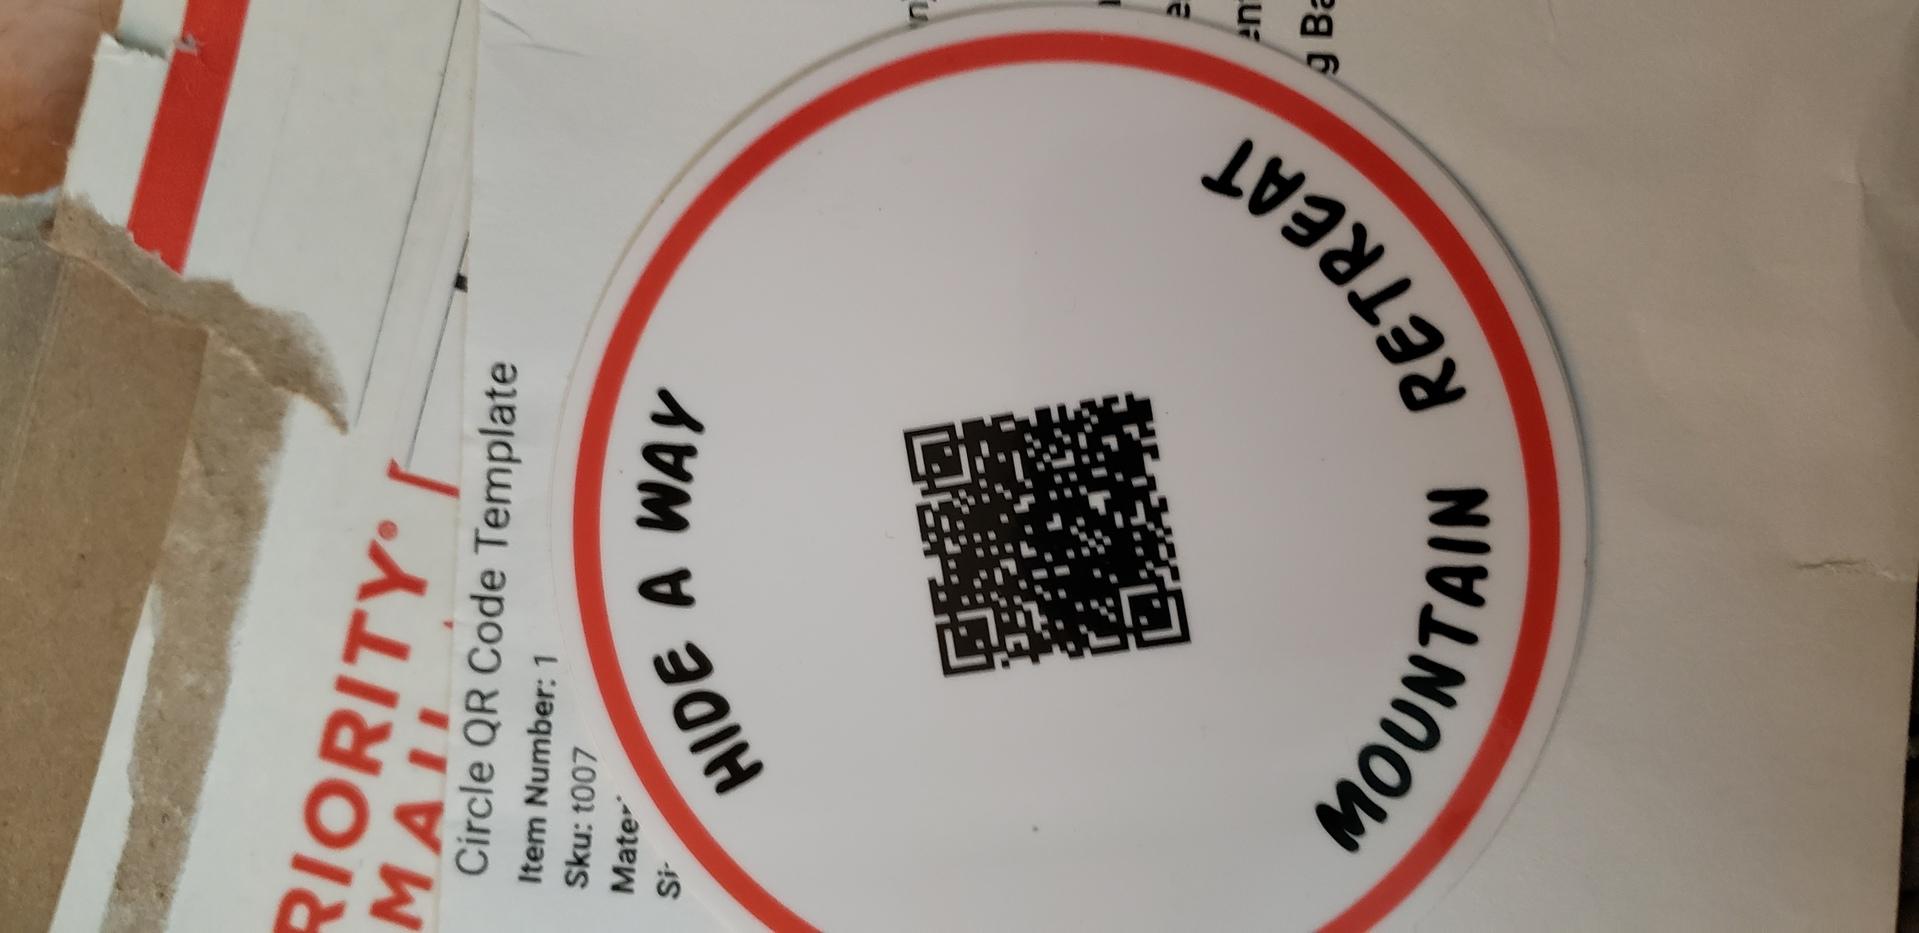 Matthew's photograph of their Circle QR Code Template